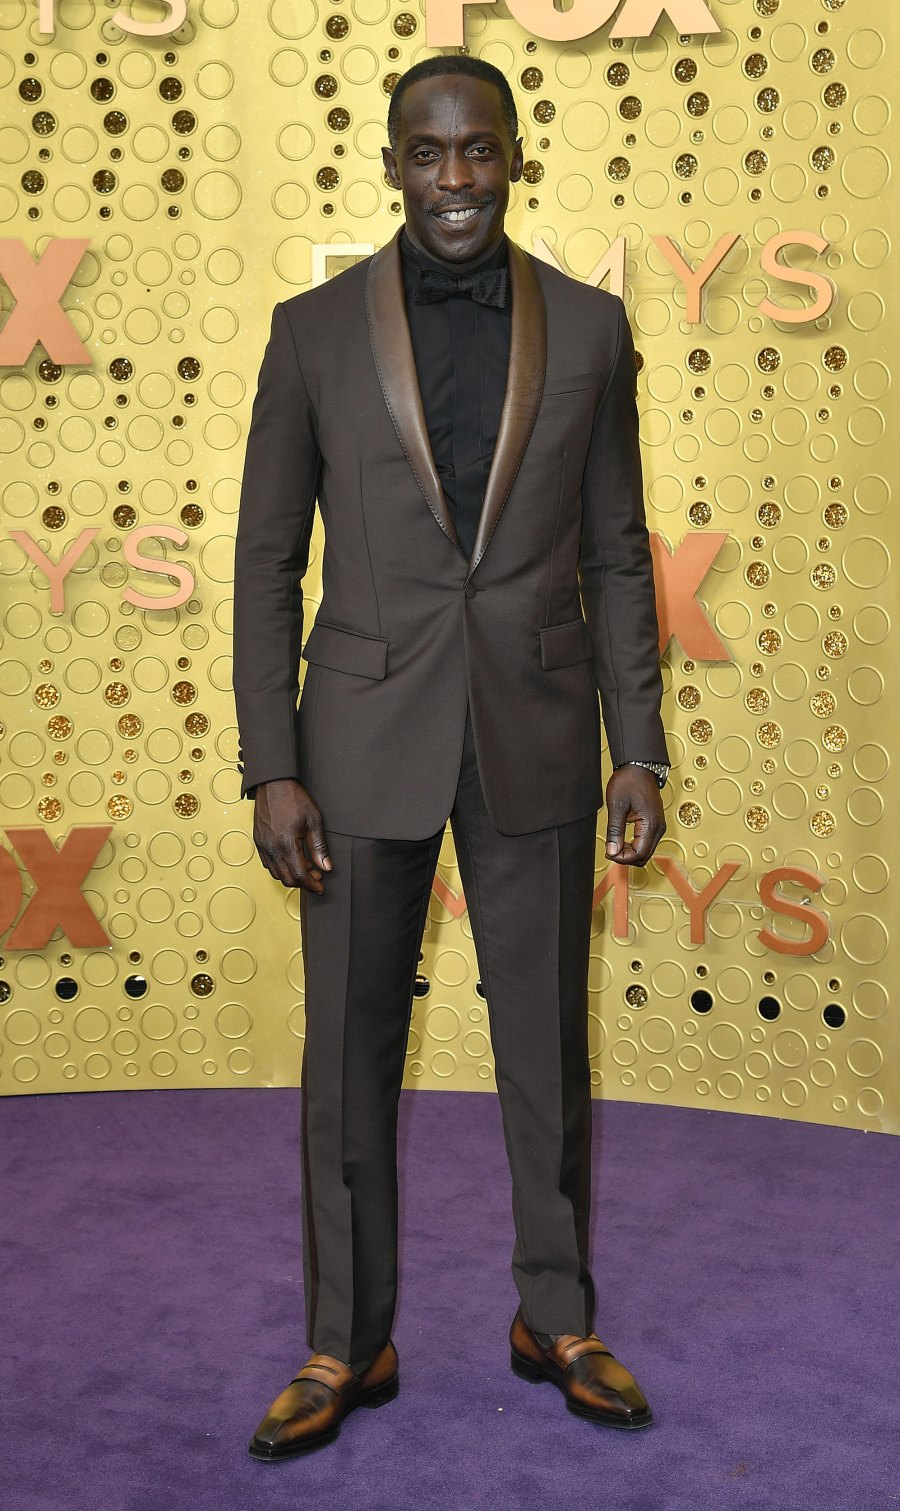 Emmys 2019 Hottest Hunks - Michael K. Williams